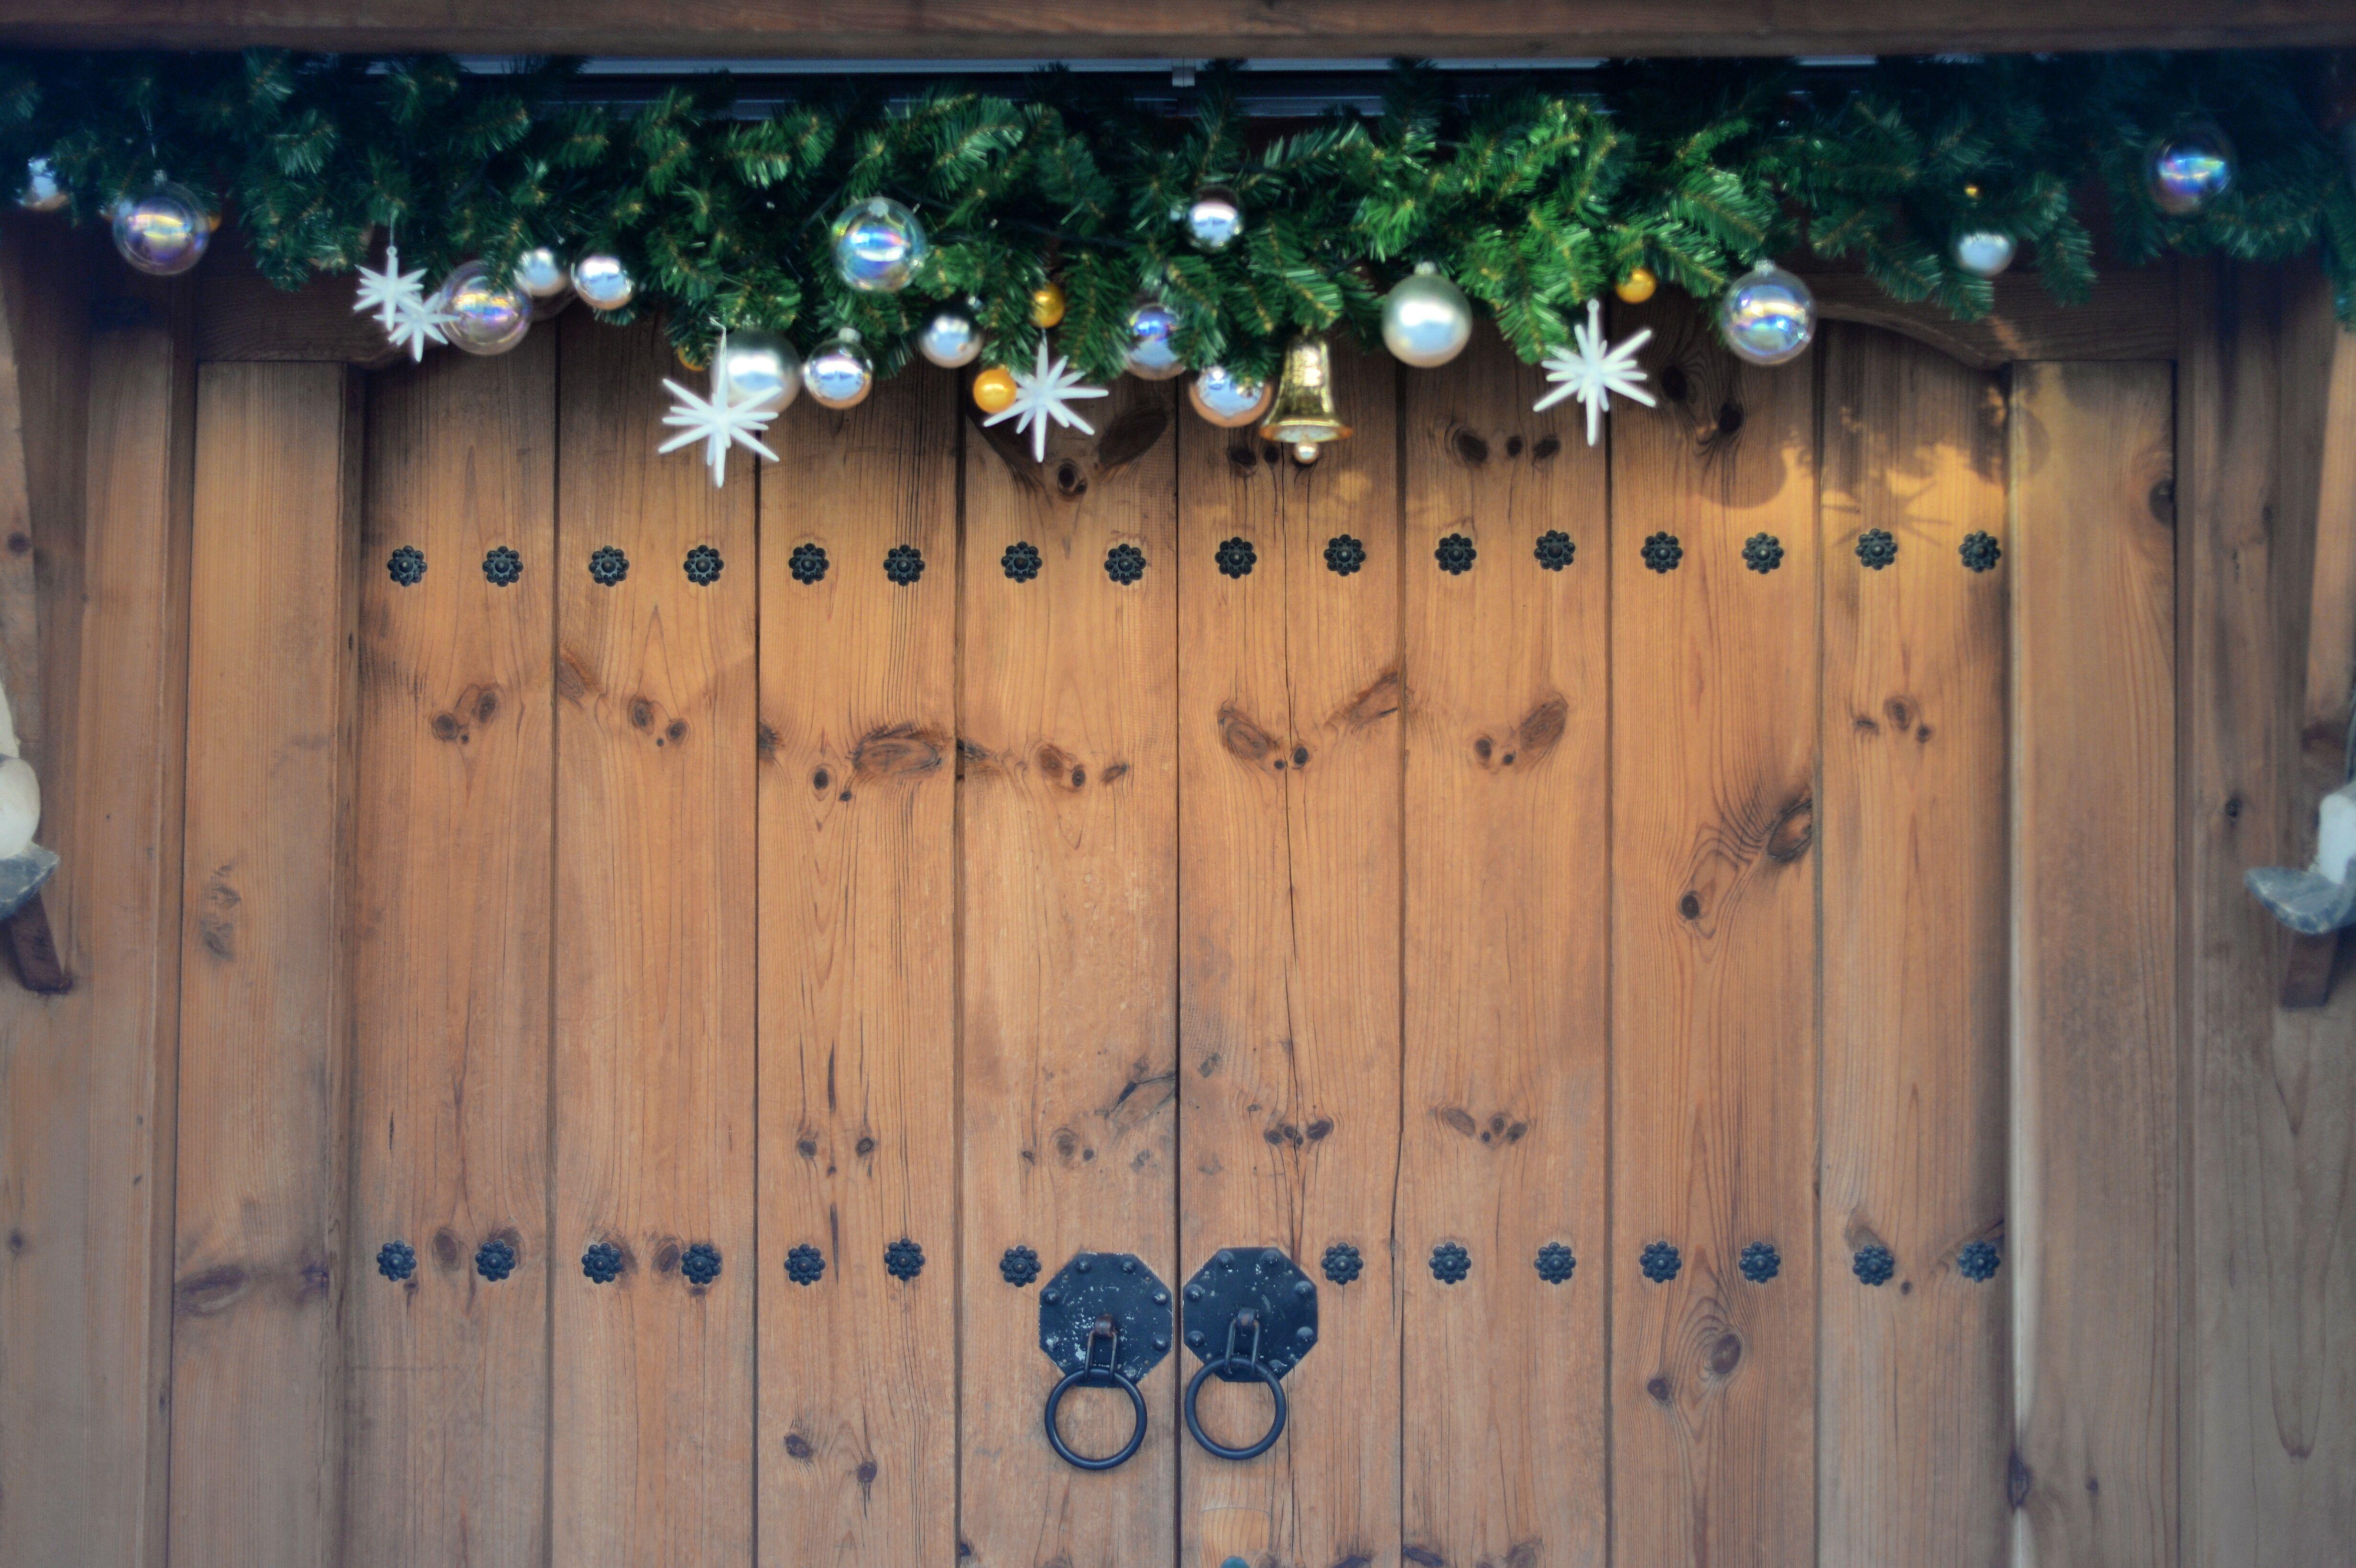 Fruit over the door christmas decoration - Christmas Decorations Hanging Over Front Door